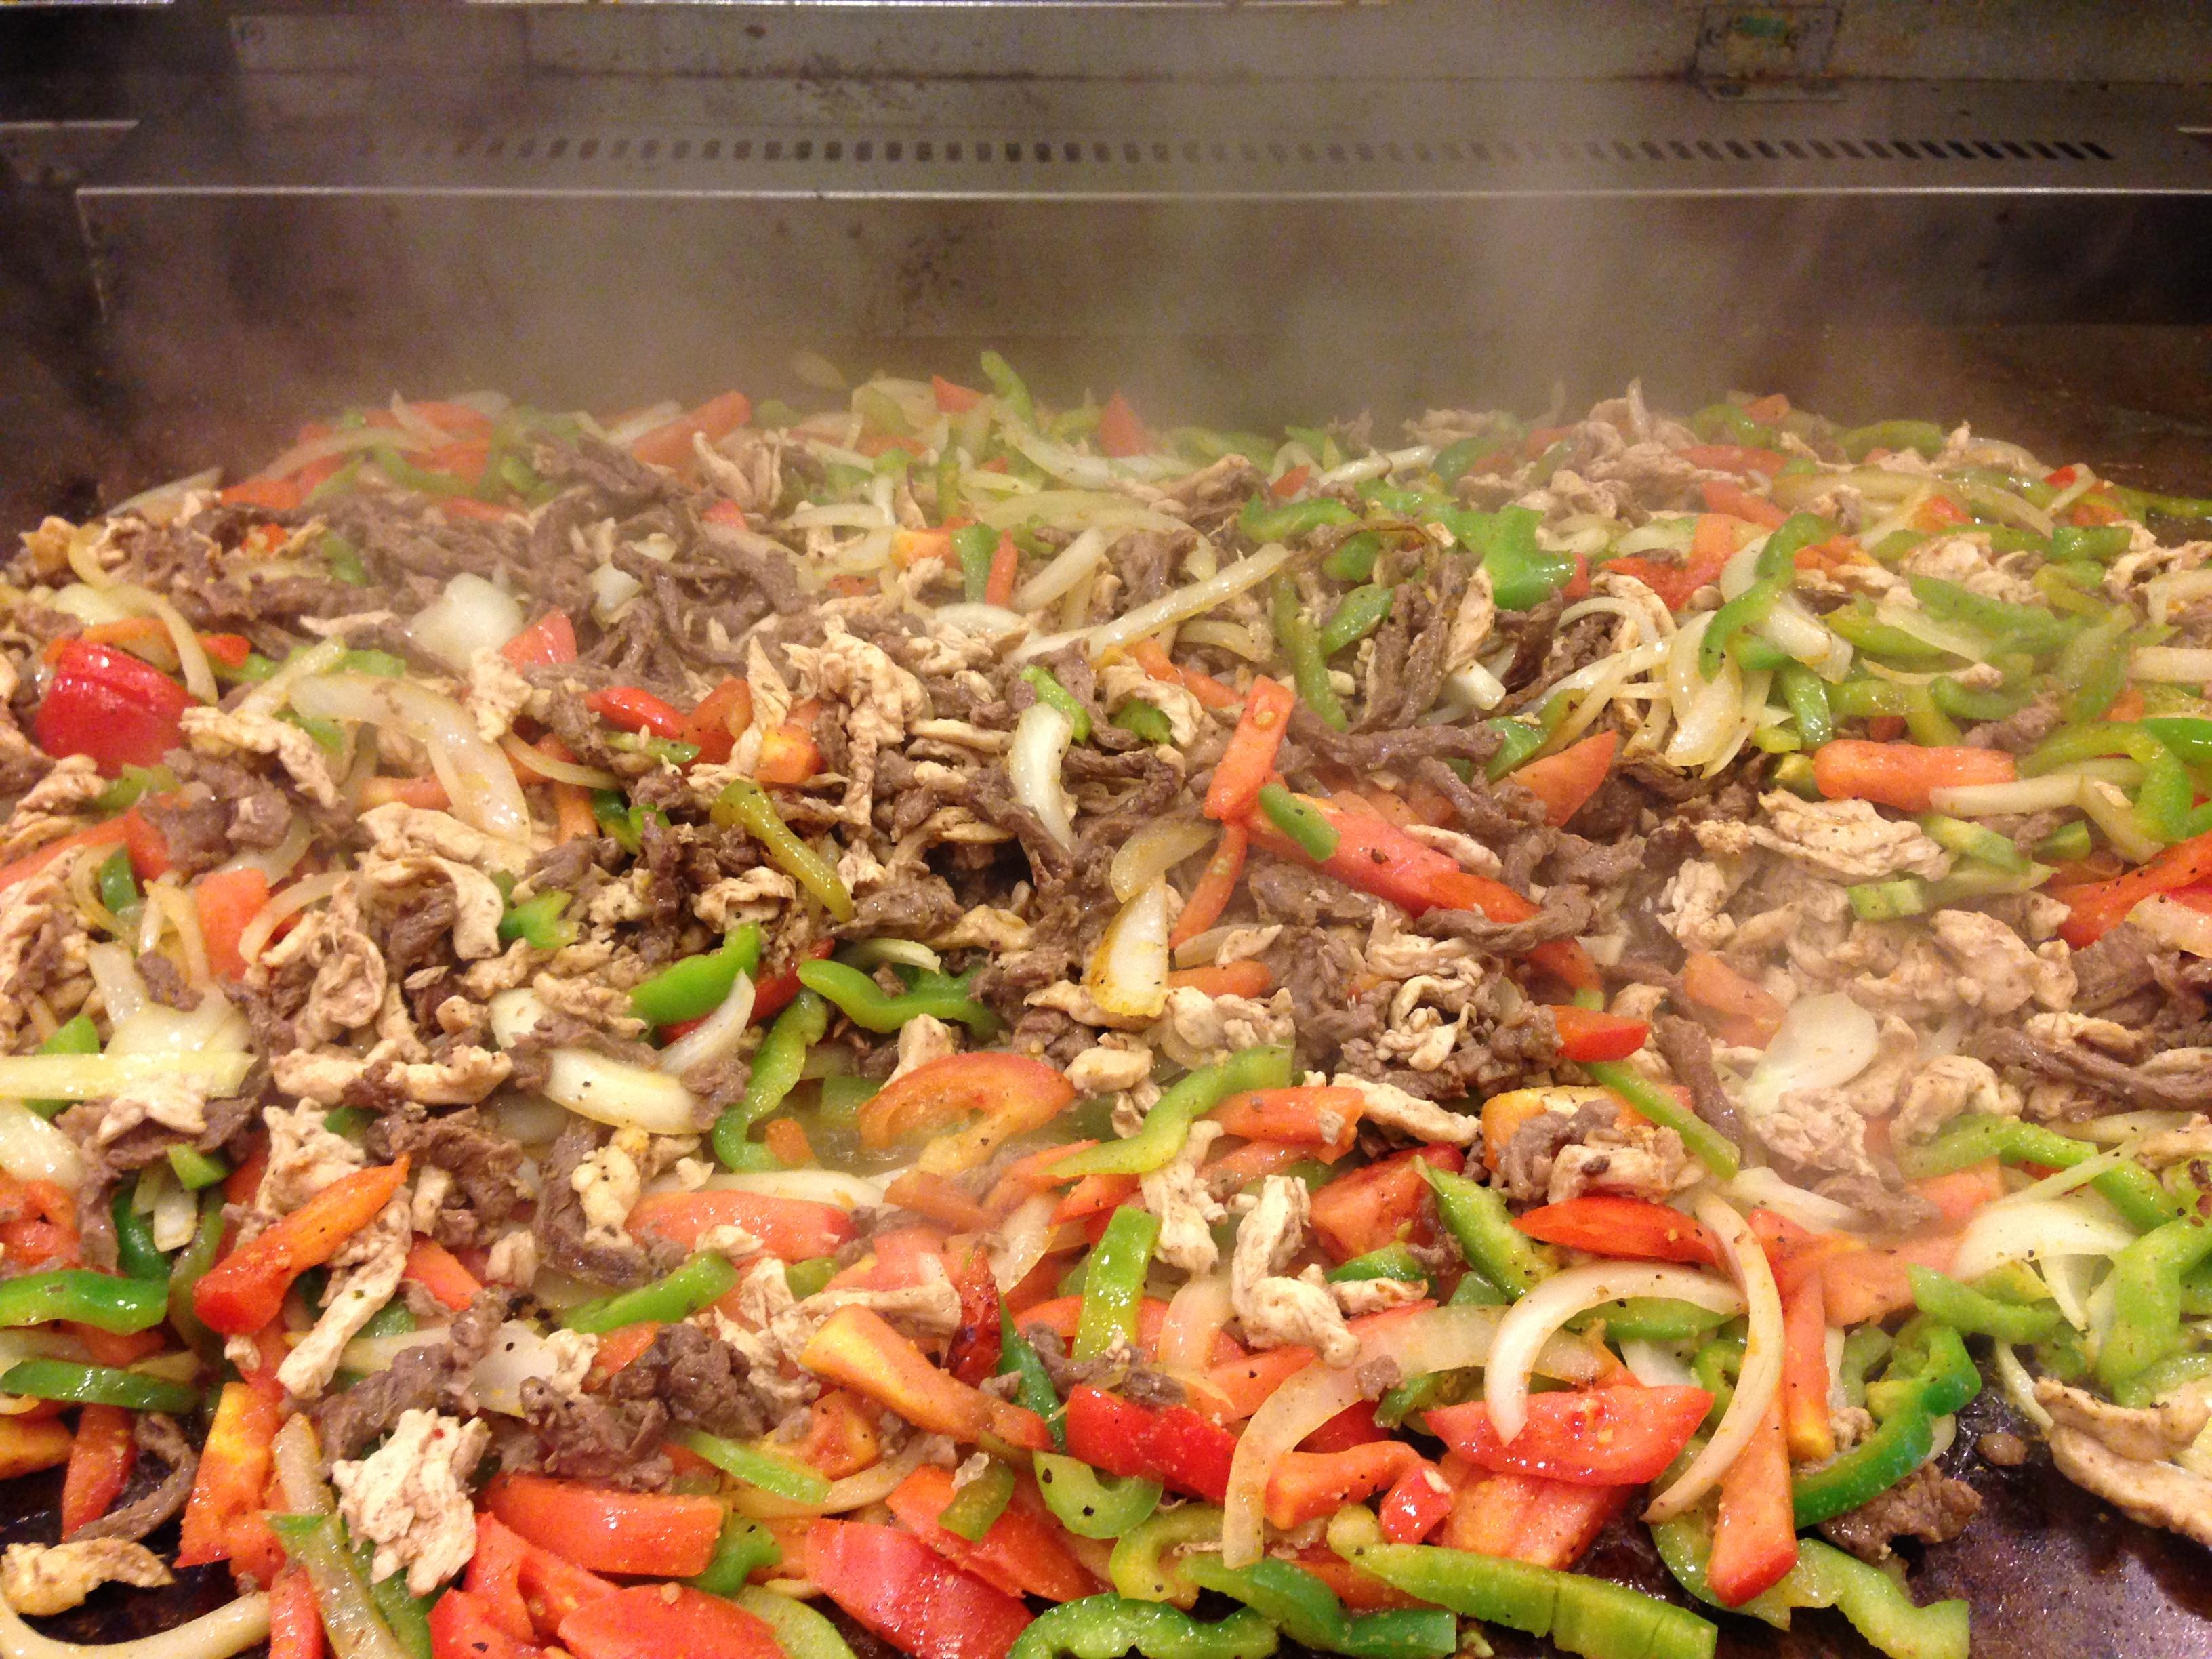 Fajitas Chicken Or Steak For 50 Image